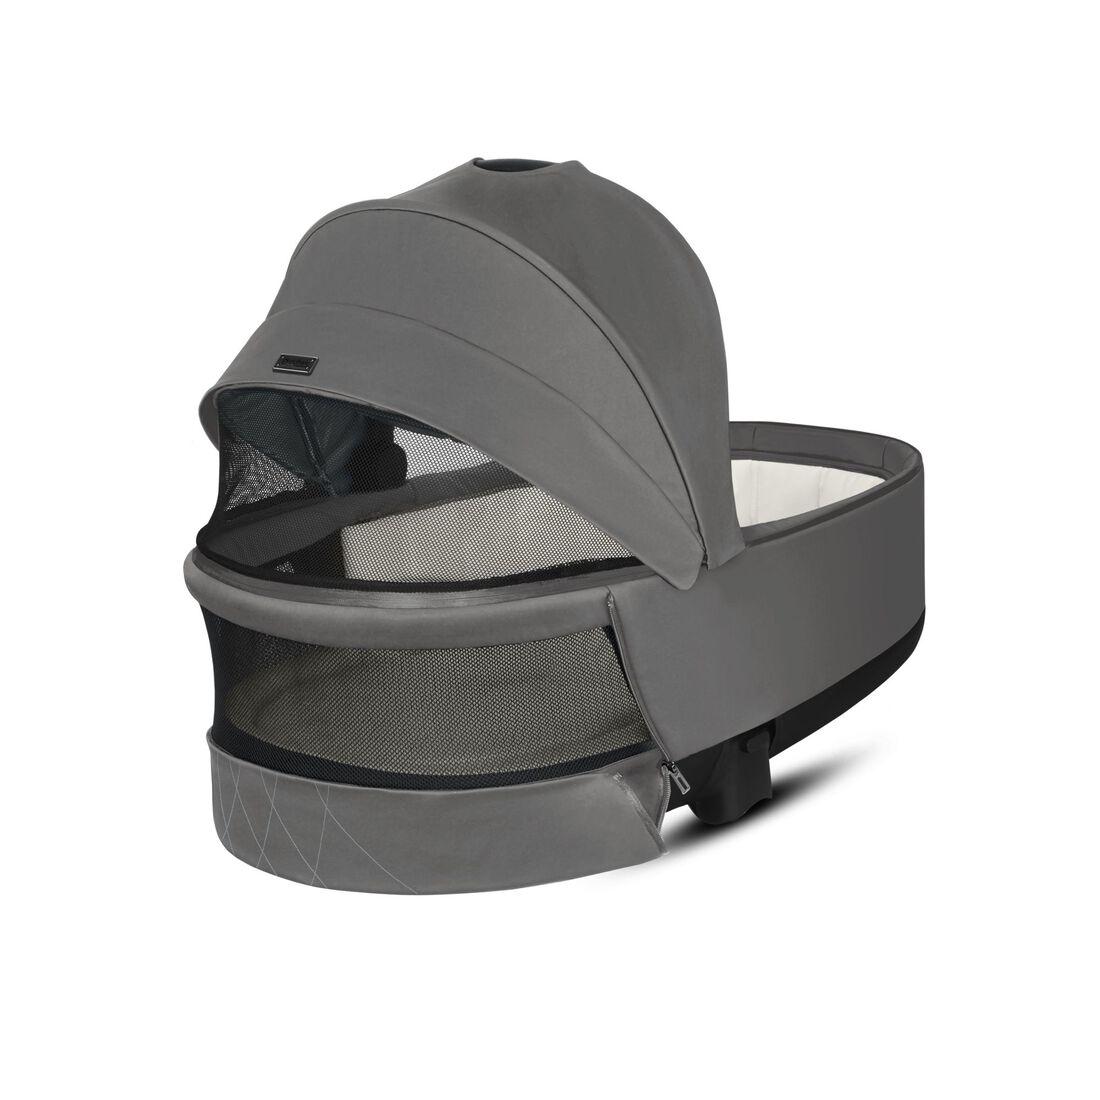 CYBEX Priam Lux Carry Cot - Soho Grey in Soho Grey large Bild 4